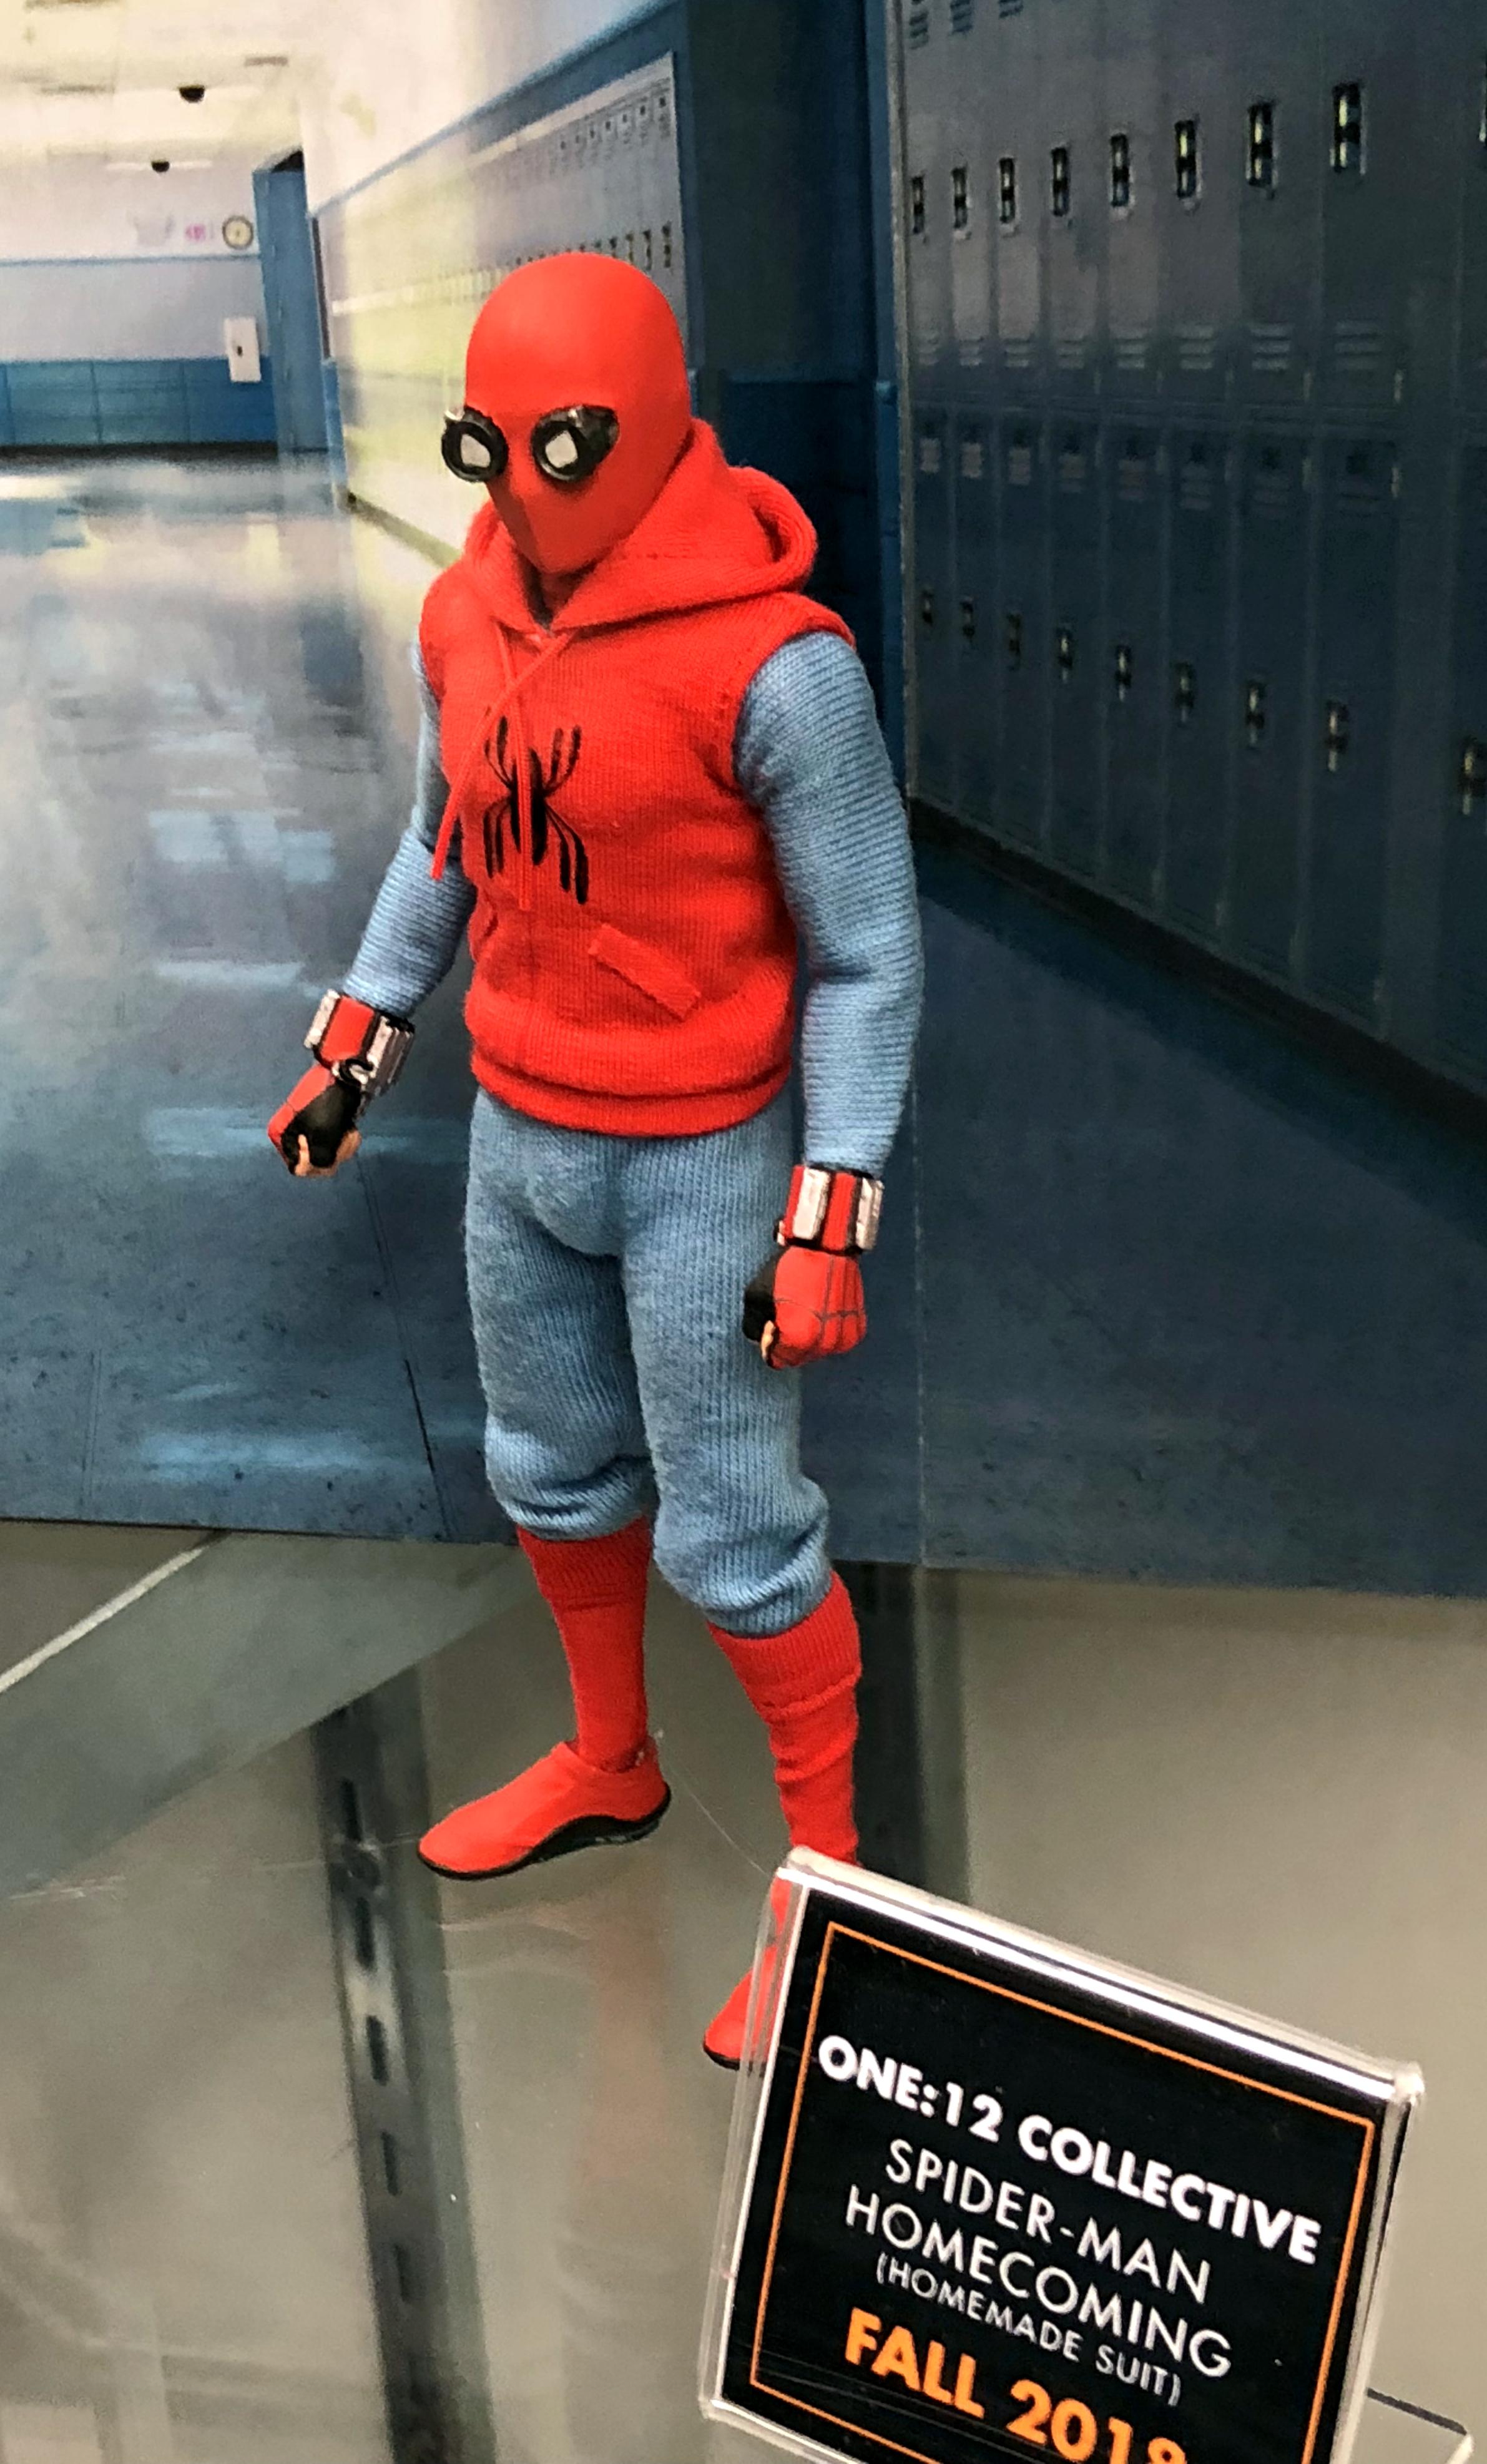 » 2018 Toy Fair Mezco One Twelve Collective Spider-Man